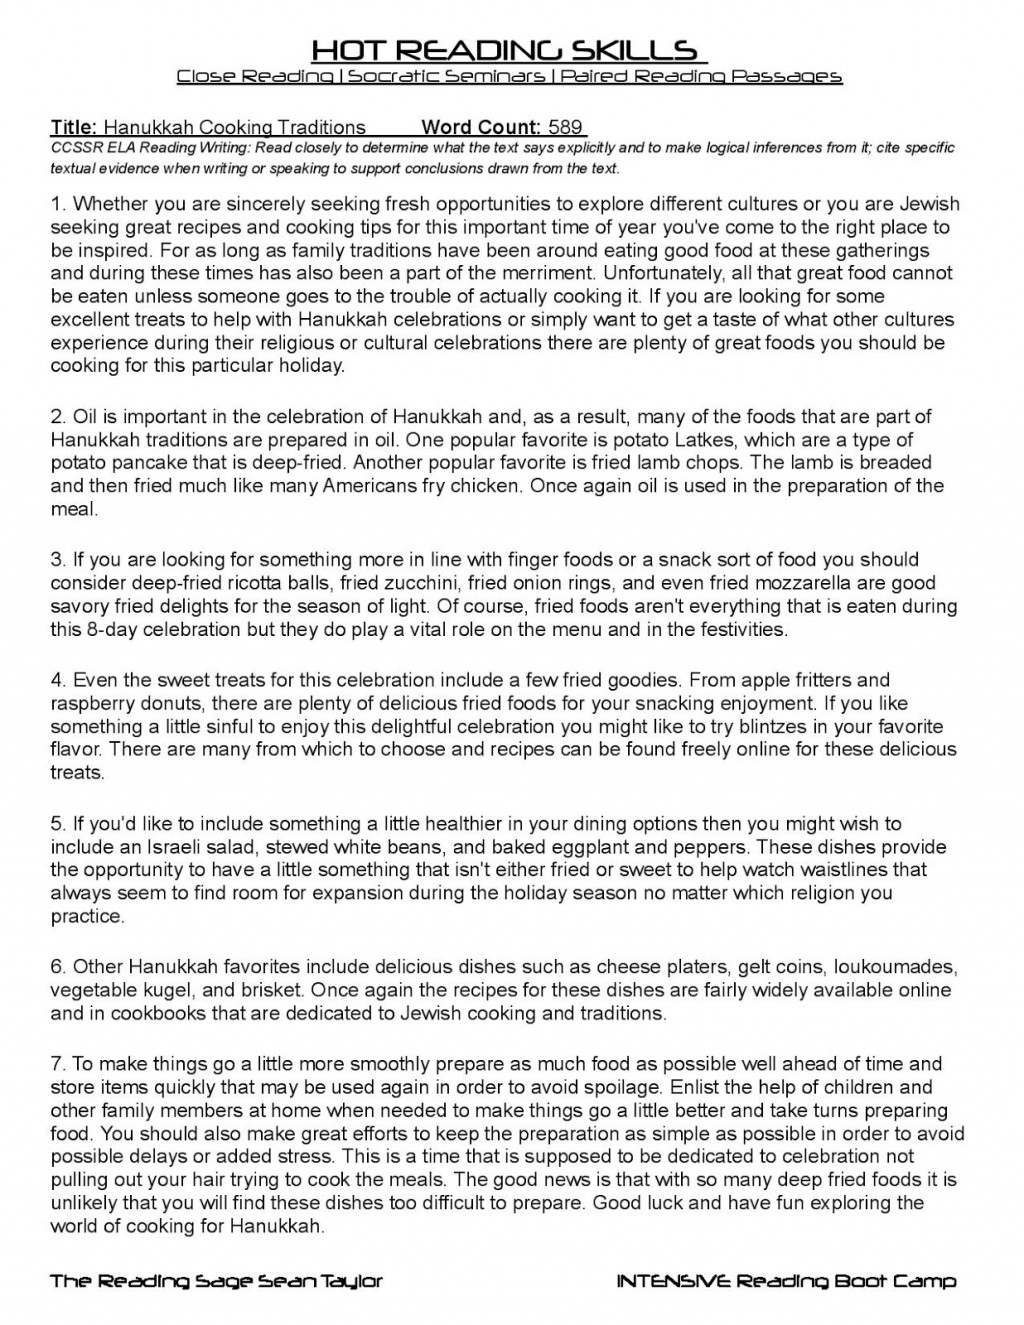 018 3762721436 Common Core College Essay Prompts Example Rare Argumentative Topics For 7th Graders High School Pdf Large